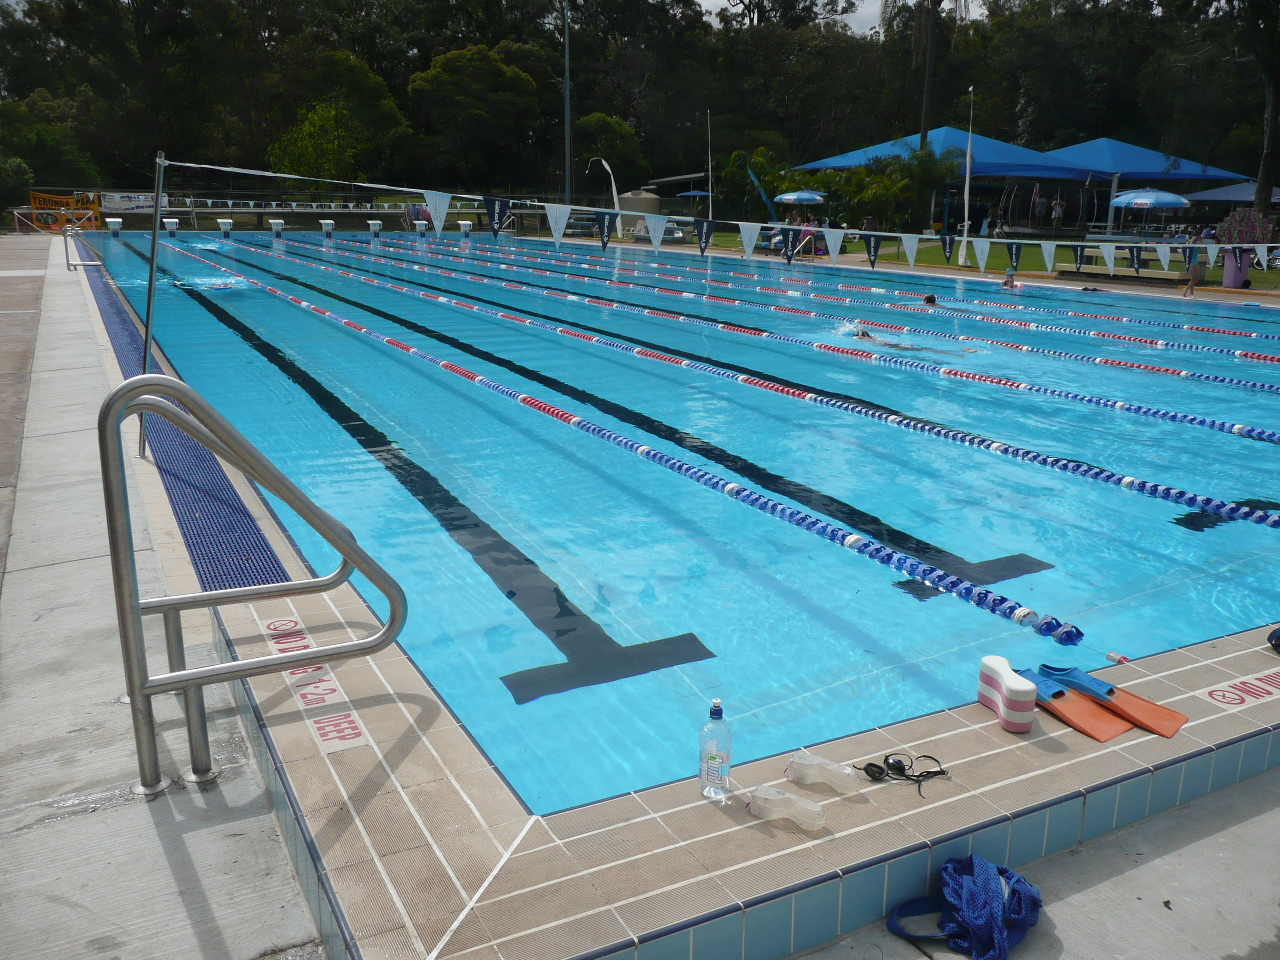 Olympic Swimming Pool 2012: Swimming Pool Wallpaper